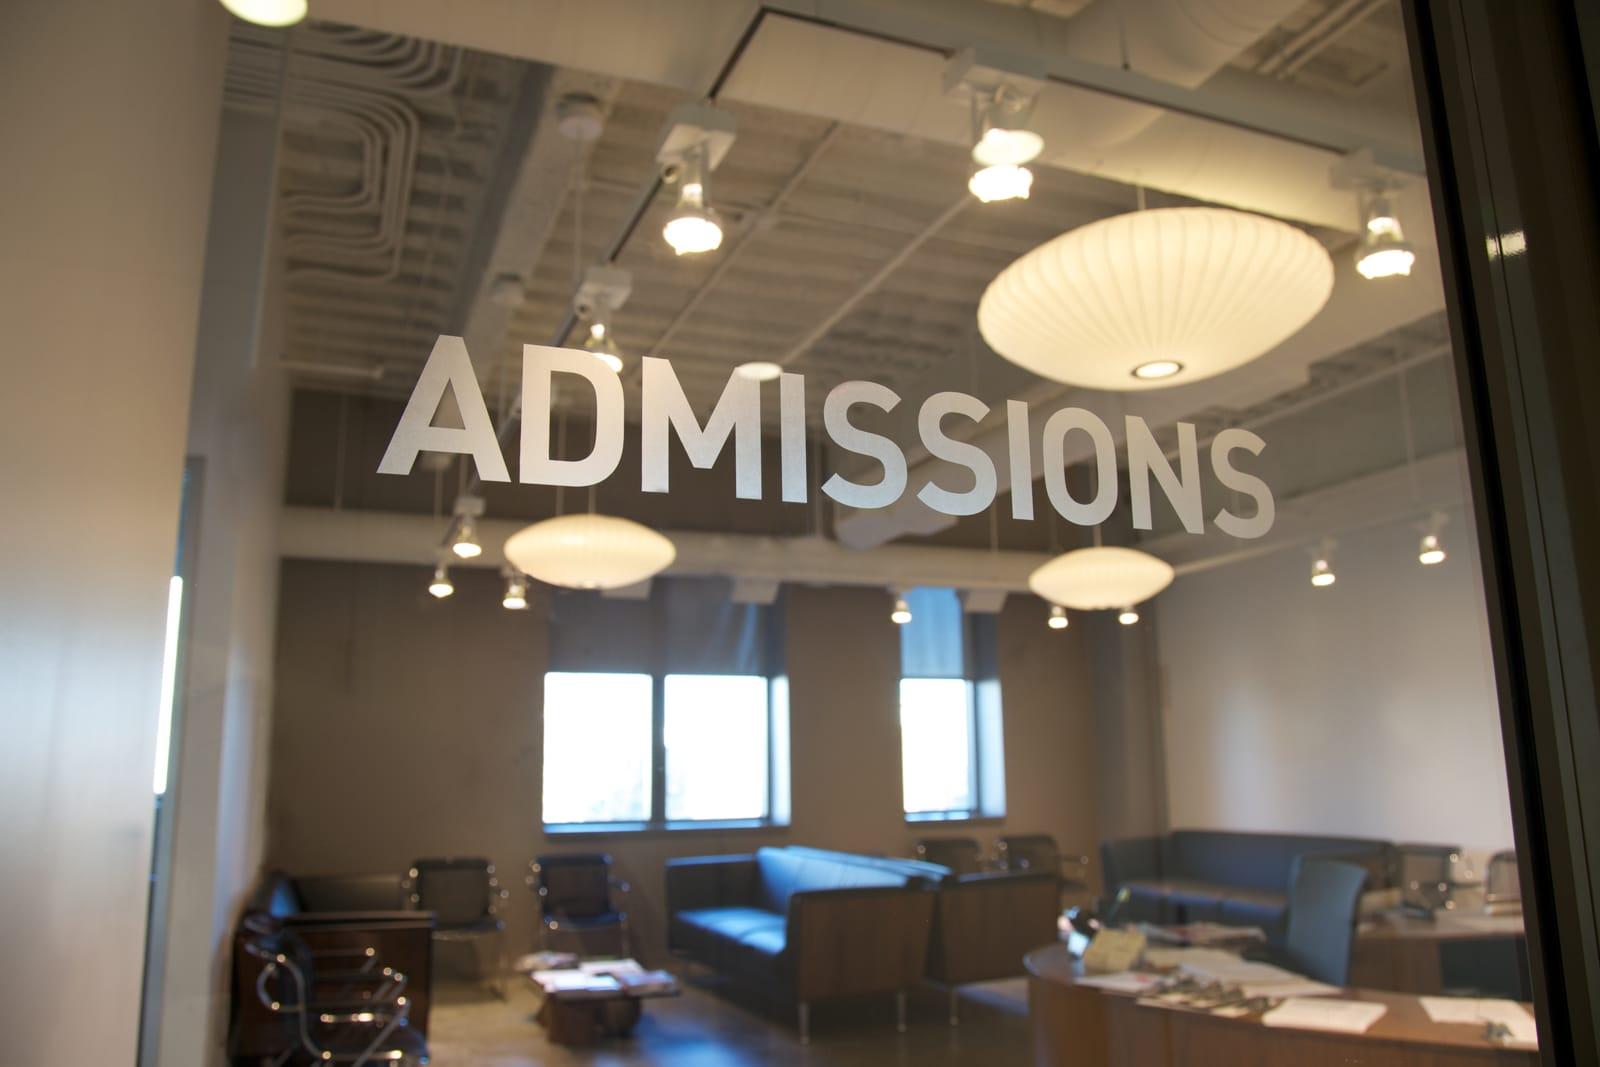 Location: Pratt Institute Brooklyn, NY Architect: WASA/Studio A